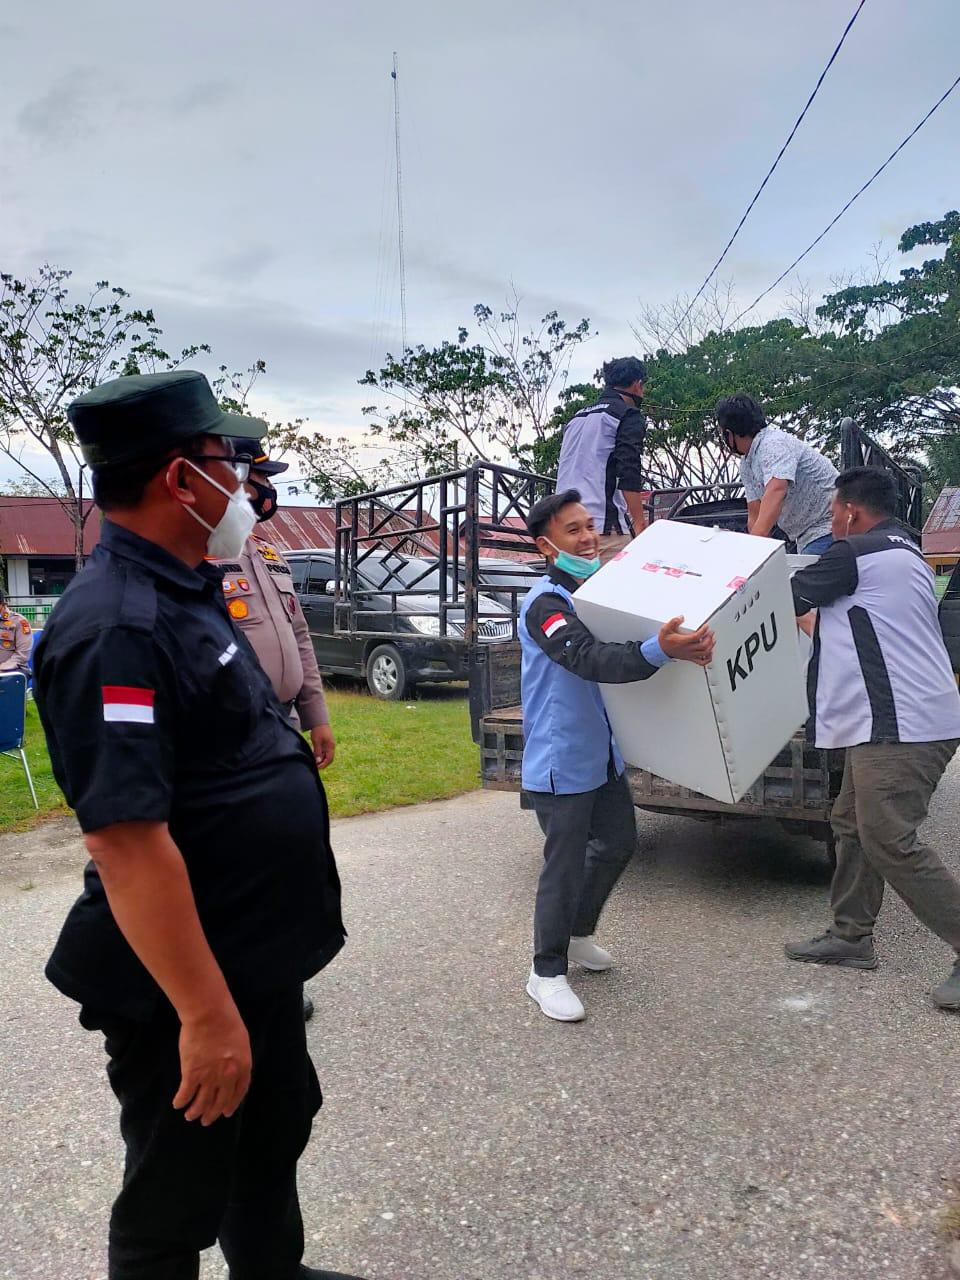 Sedikit Masalah, Bawaslu Apresiasi KPU Se-Provinsi Riau, Pelaksanaan Pilkada Tahun 2020 Berjalan Sukses, Aman dan Lancar